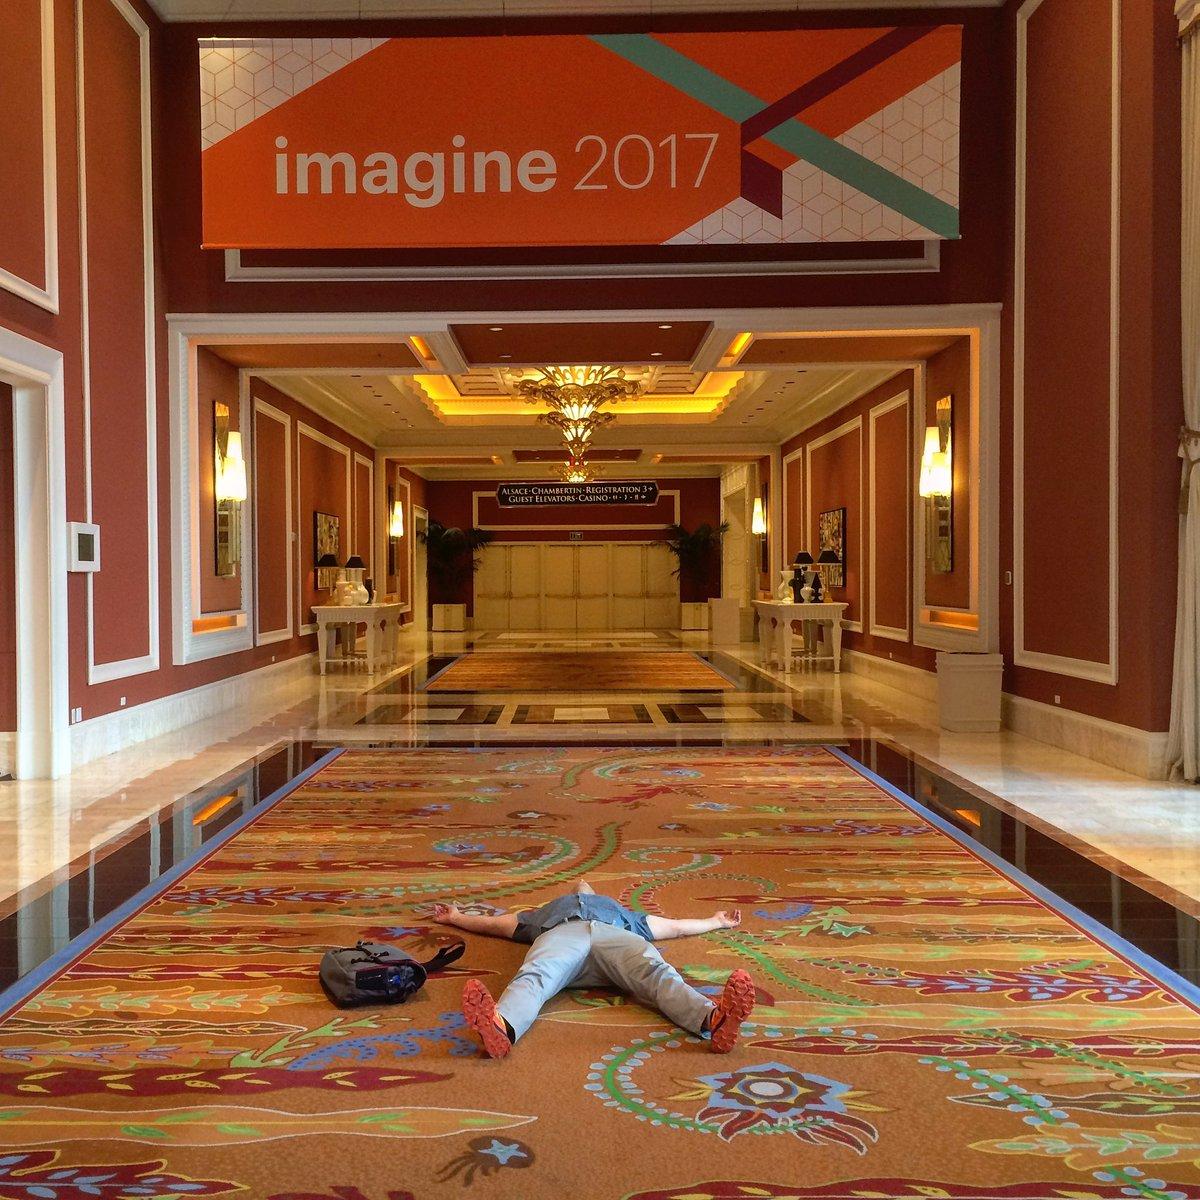 schawelcoles: The End. nn#magentoimagine2017 #Magentoimagine #magento #ecommerce #wecommerce https://t.co/HjkW04v9mr